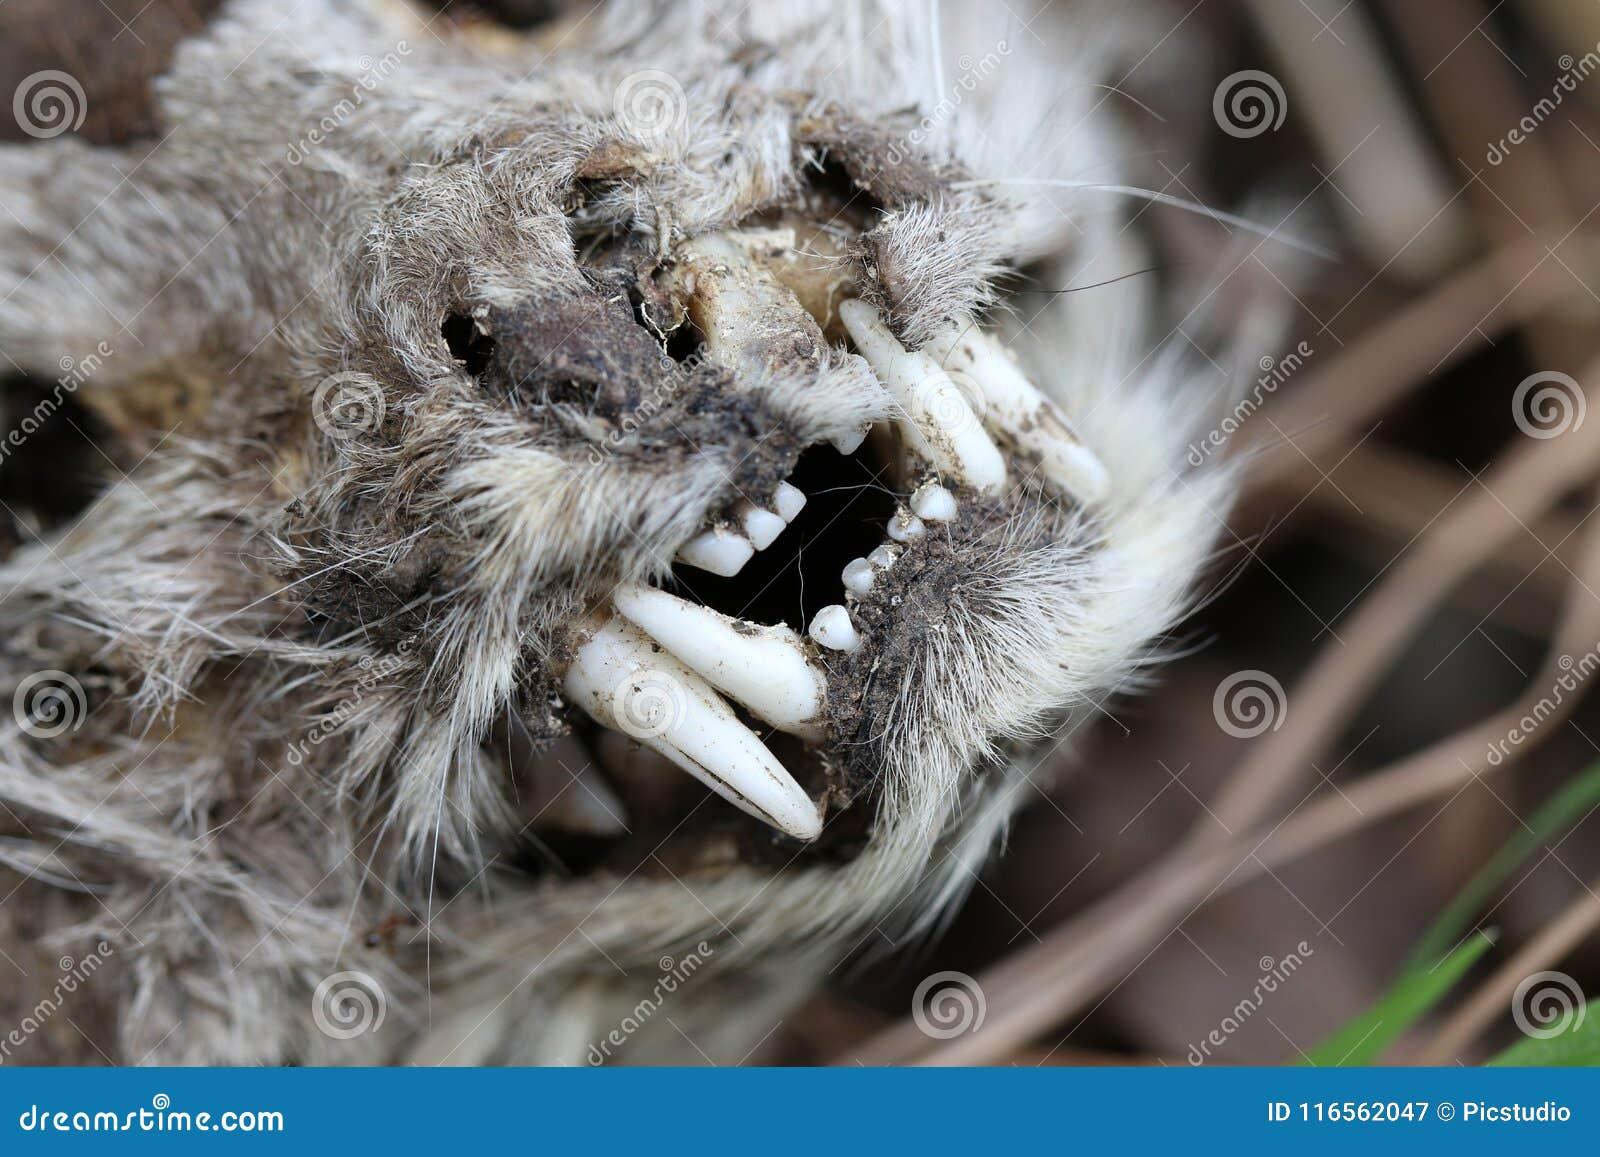 Cat face skeleton